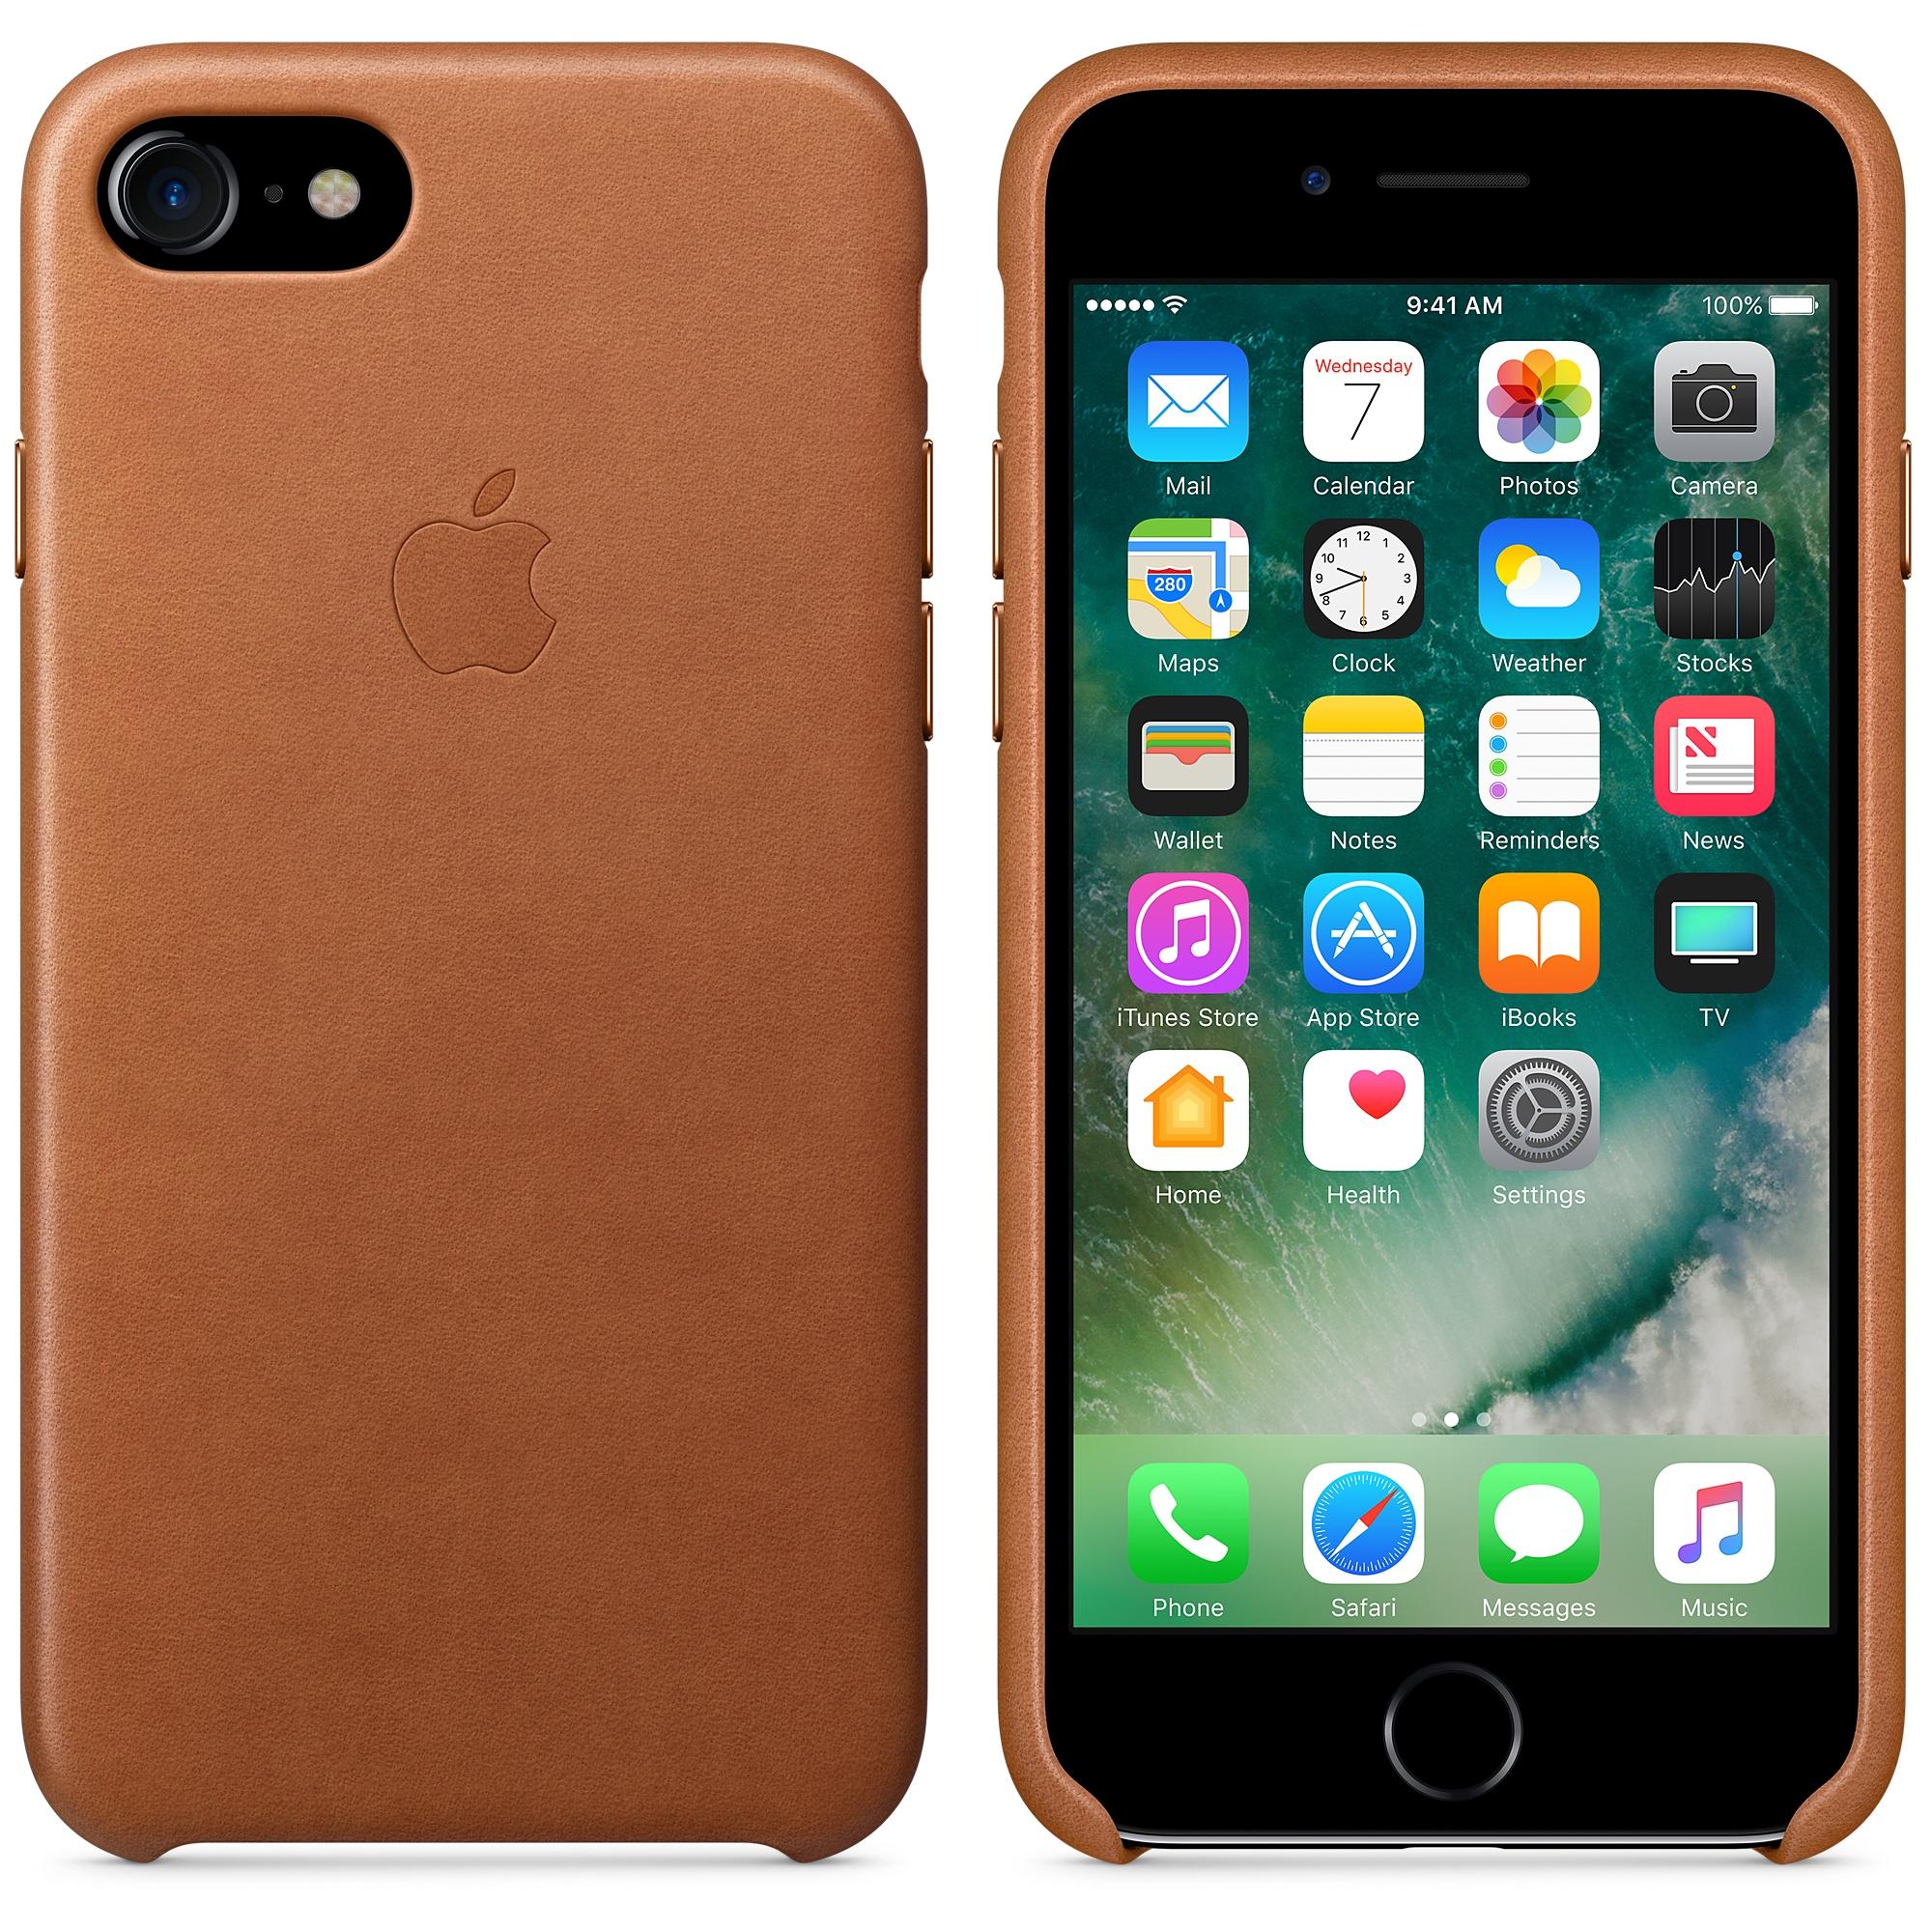 Pouzdra, kryty a obaly na Apple iPhone 7 / 8